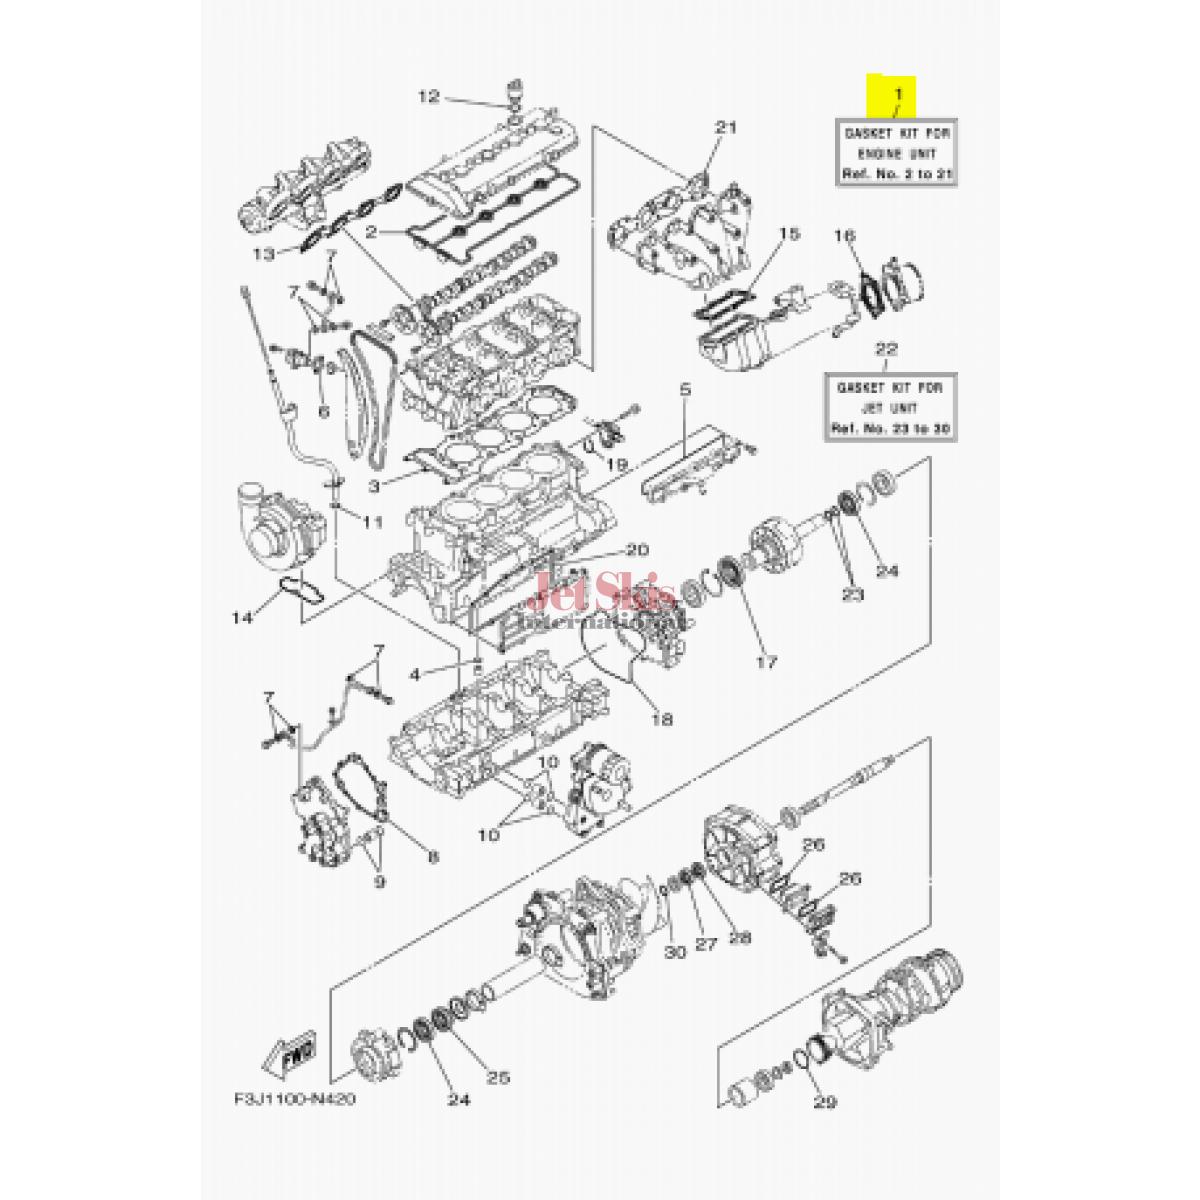 Yamaha 6et W 00 00 Gasket Kit For Engine Unit